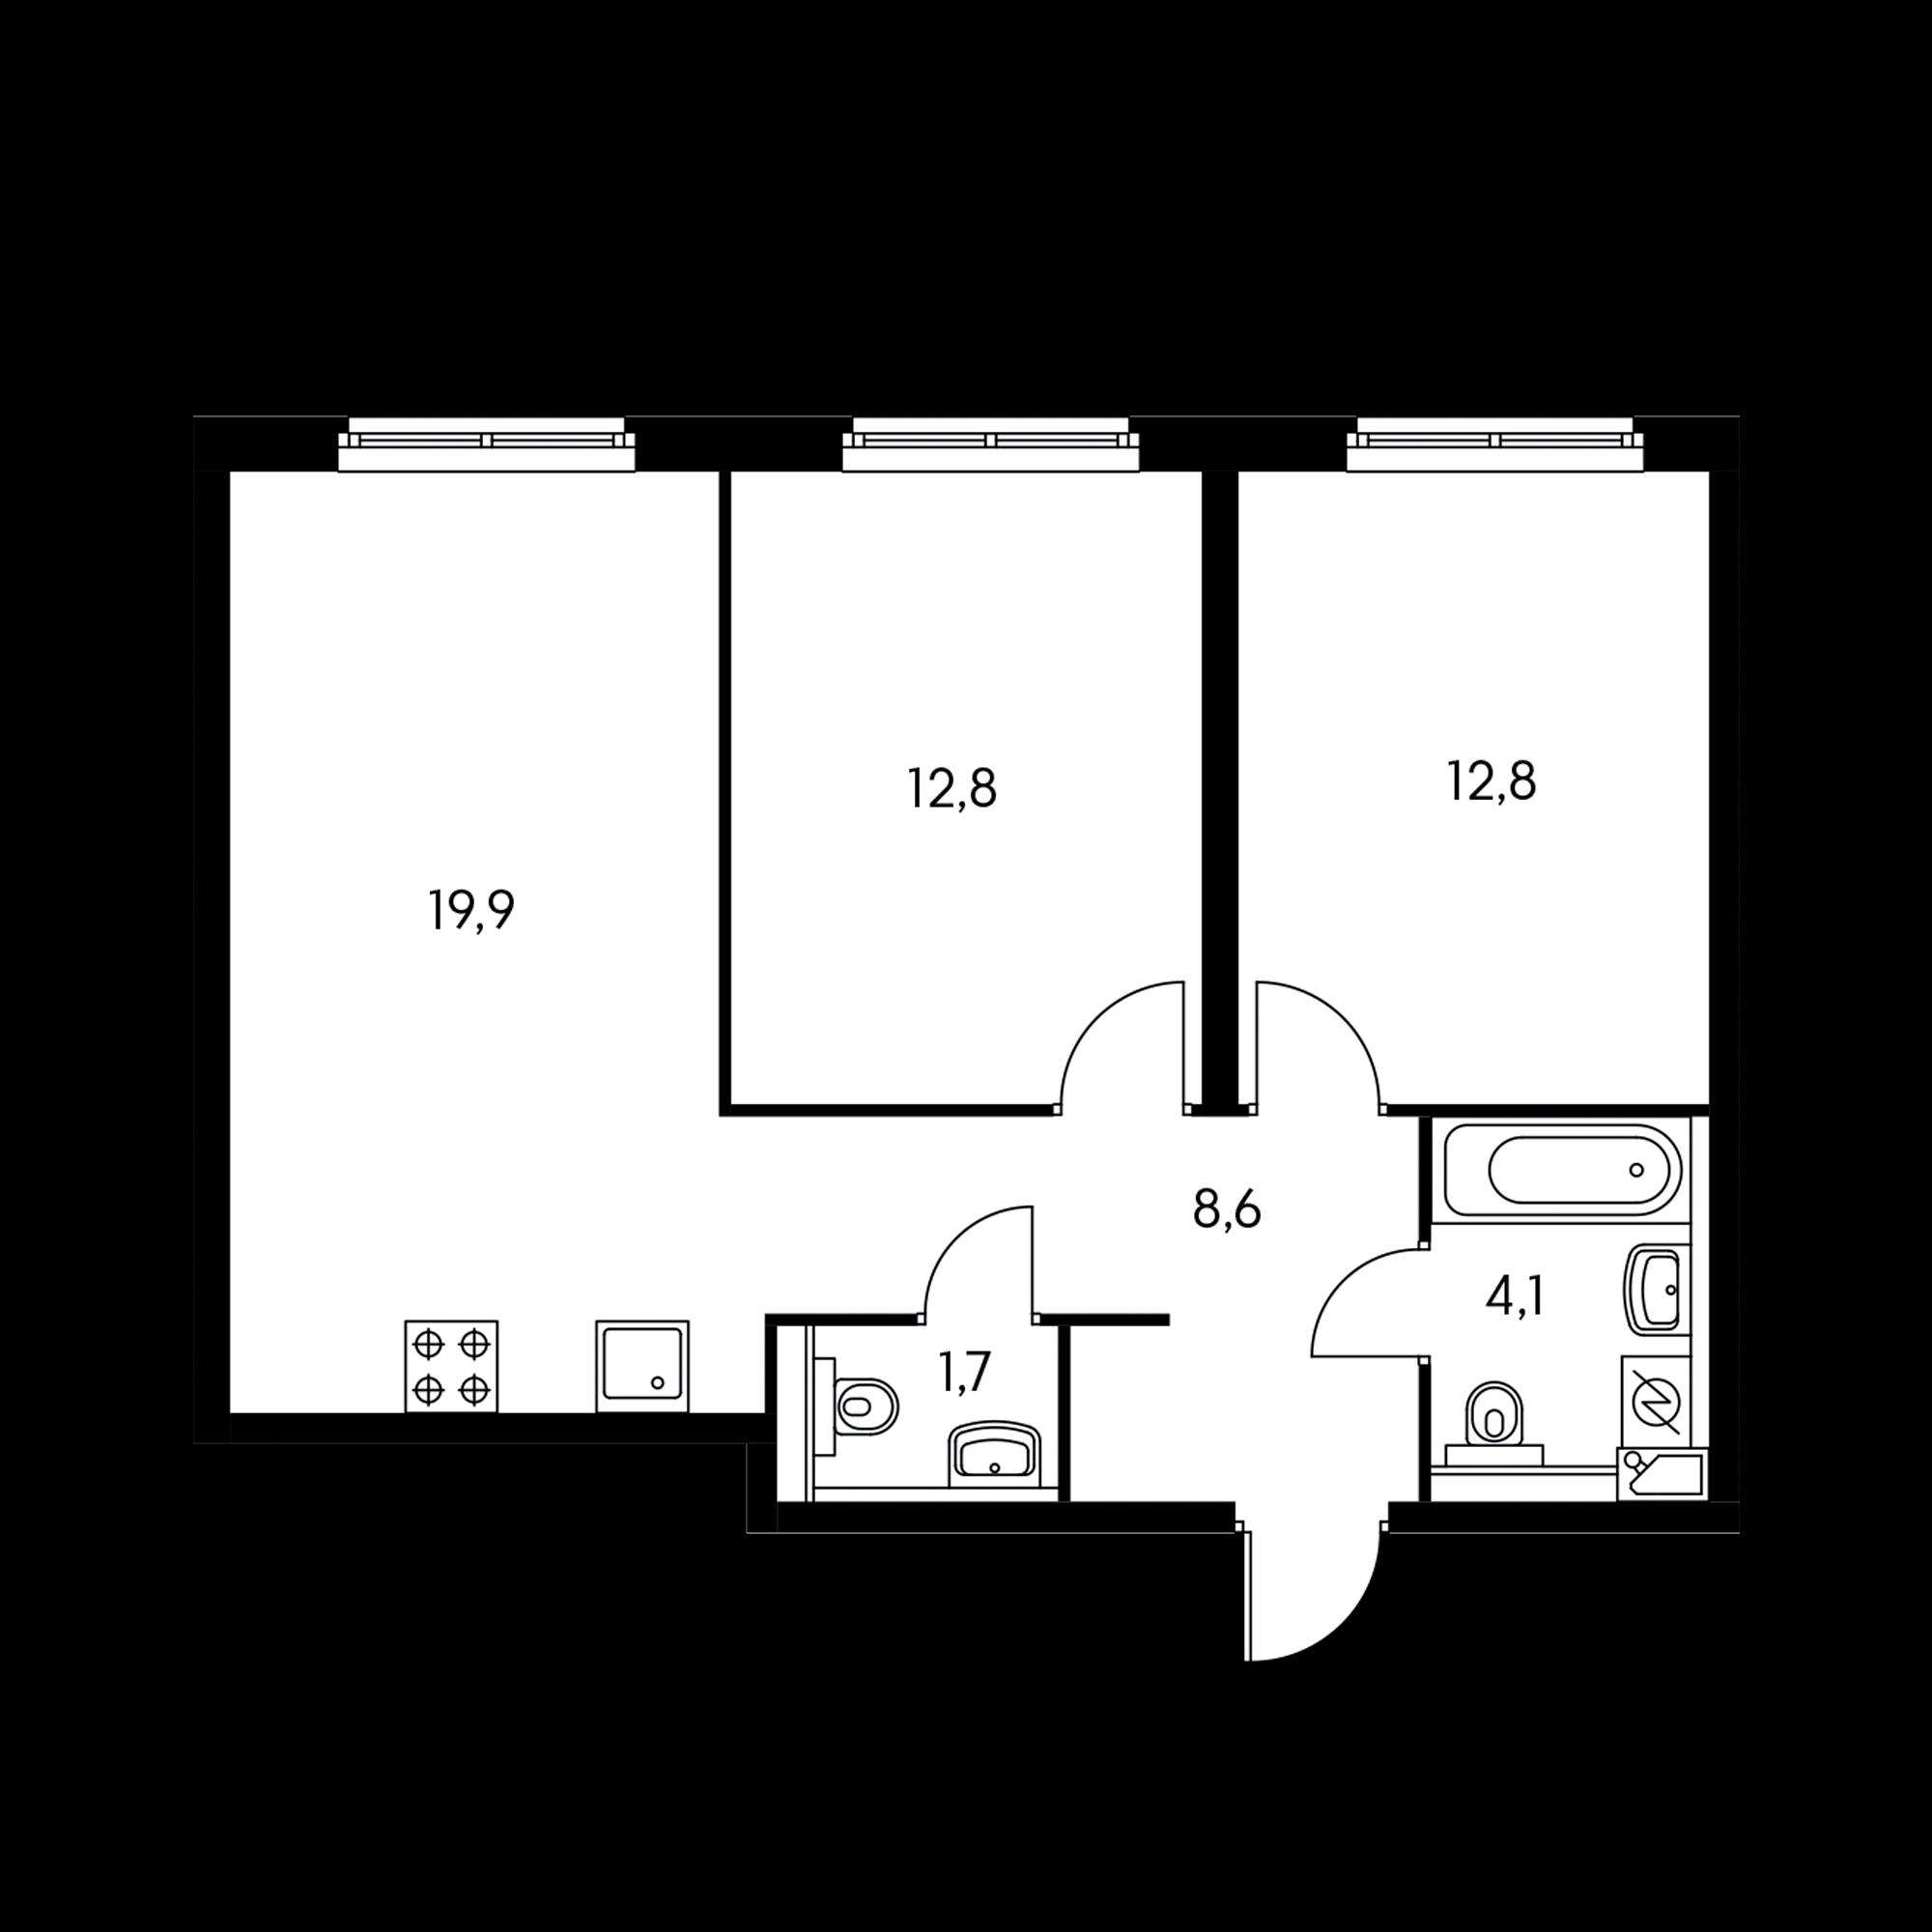 2EM8_9.9-1*